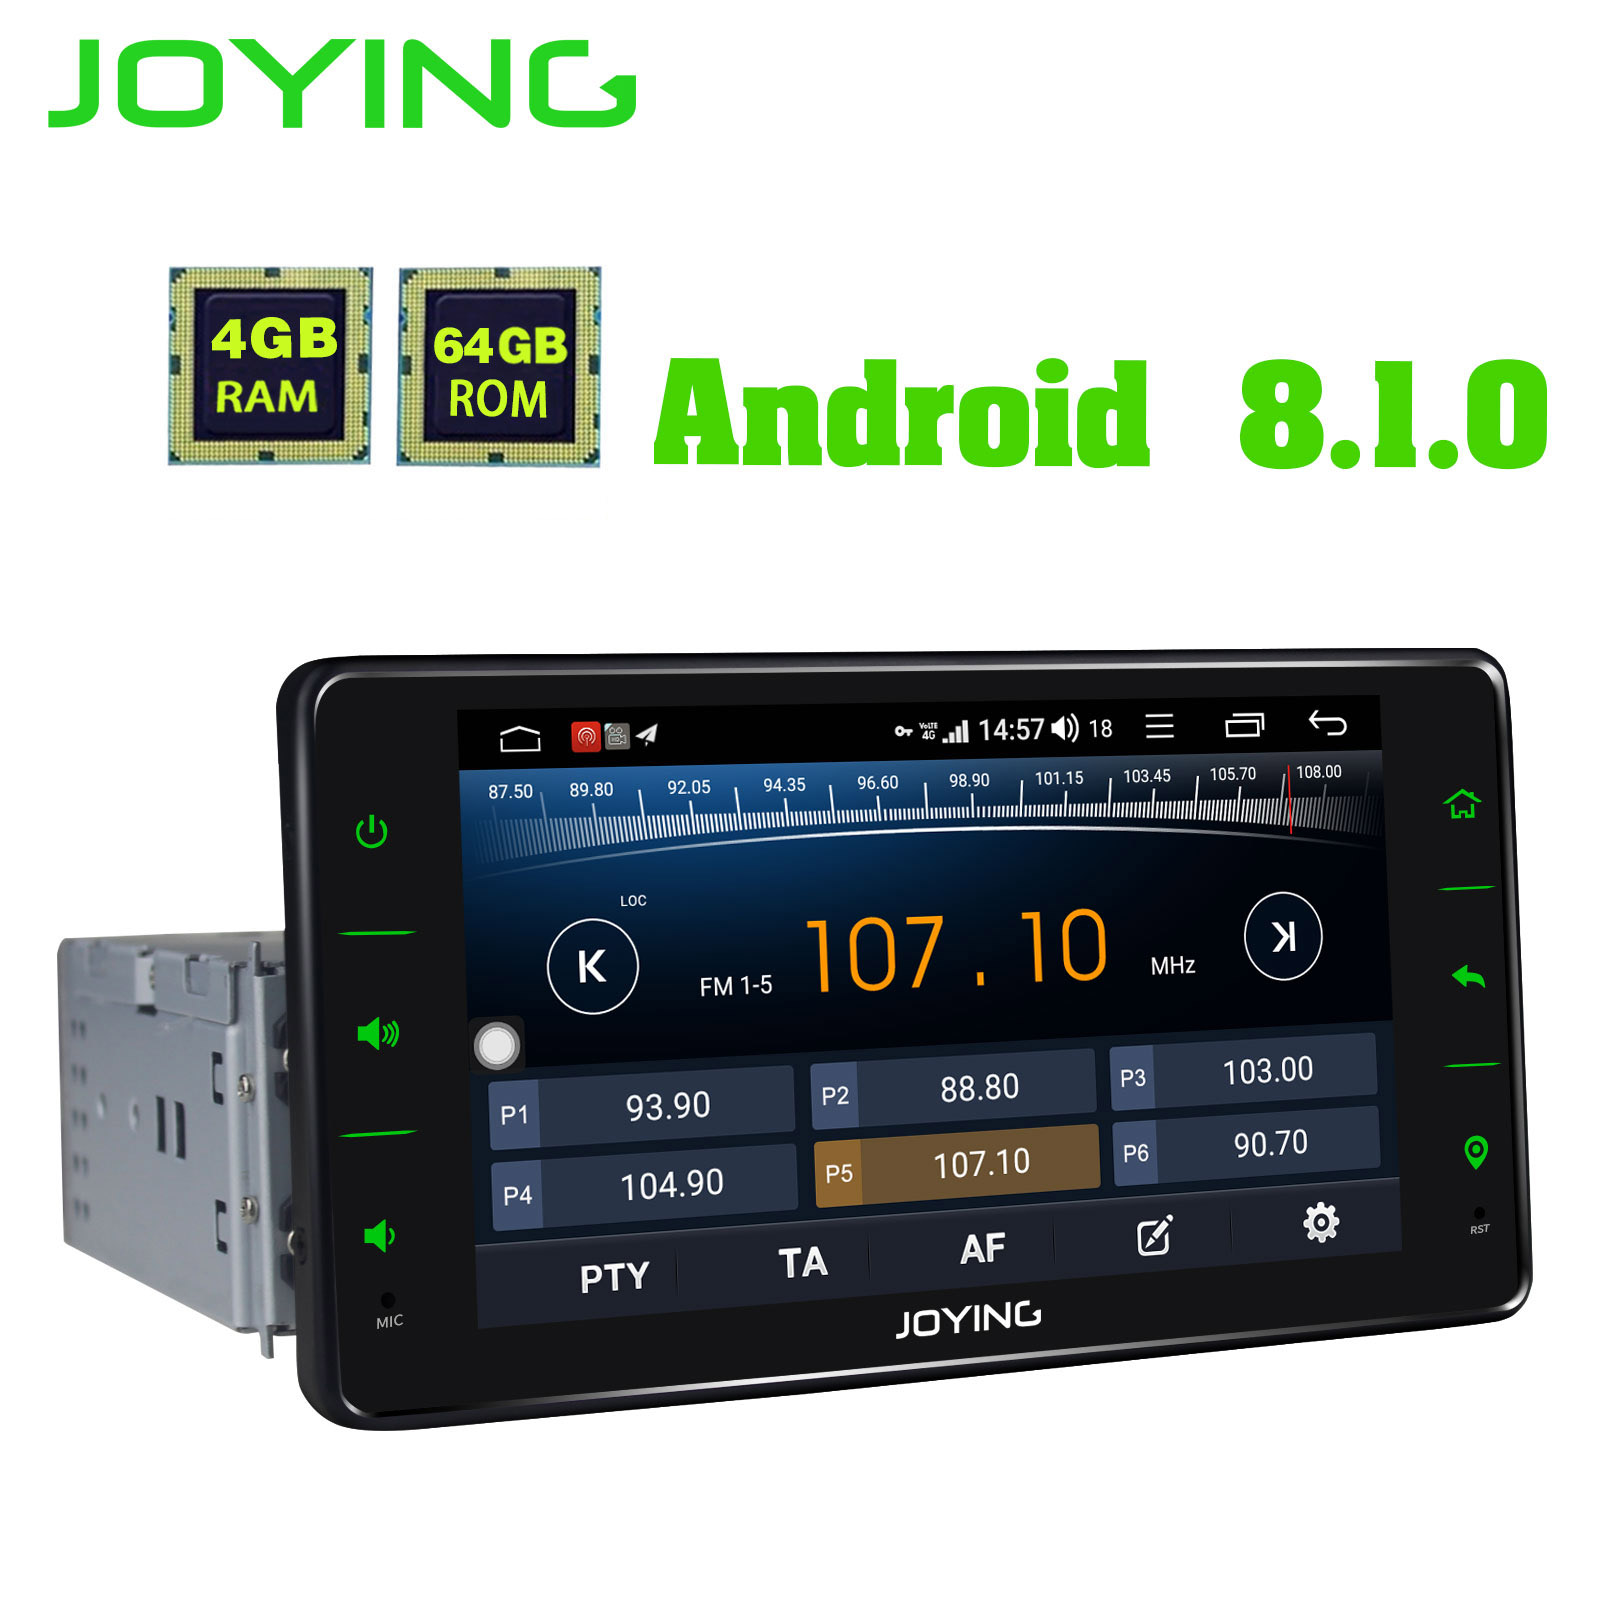 JOYING 6 2 inch 4GB 64GB Car Radio player GPS Android 8 1 Octa Core support